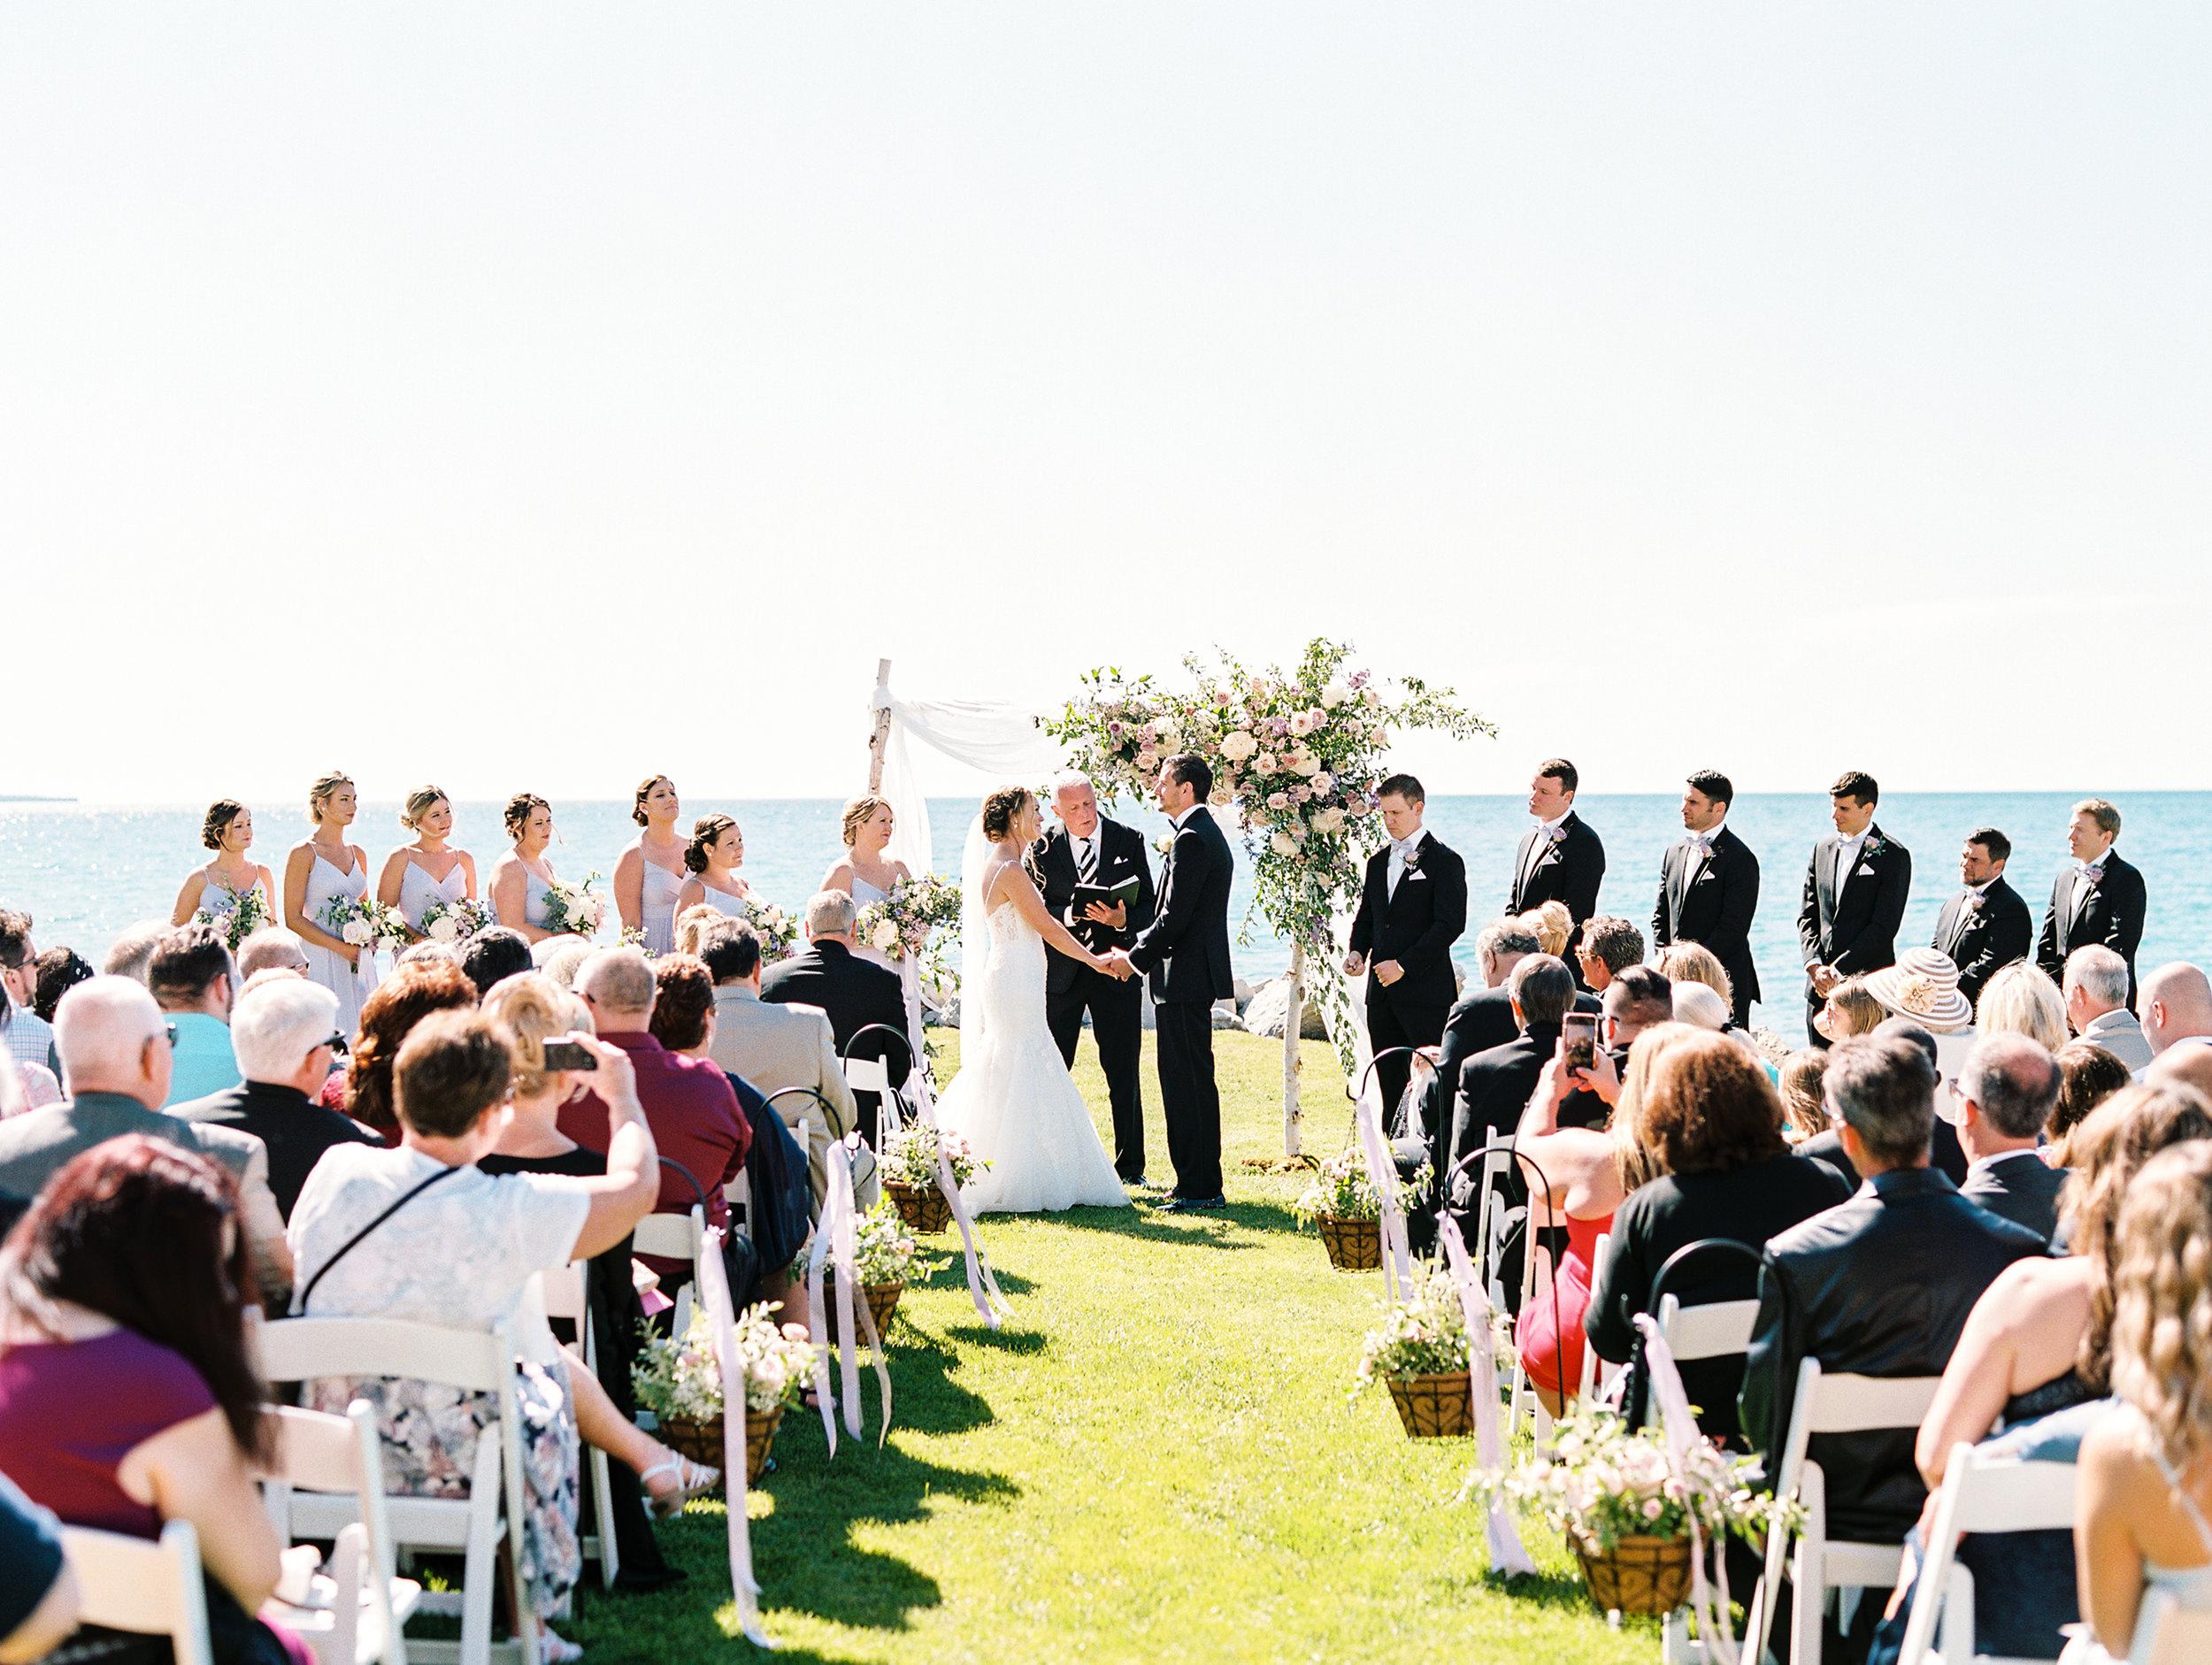 Noss+Wedding+Ceremony-228.jpg